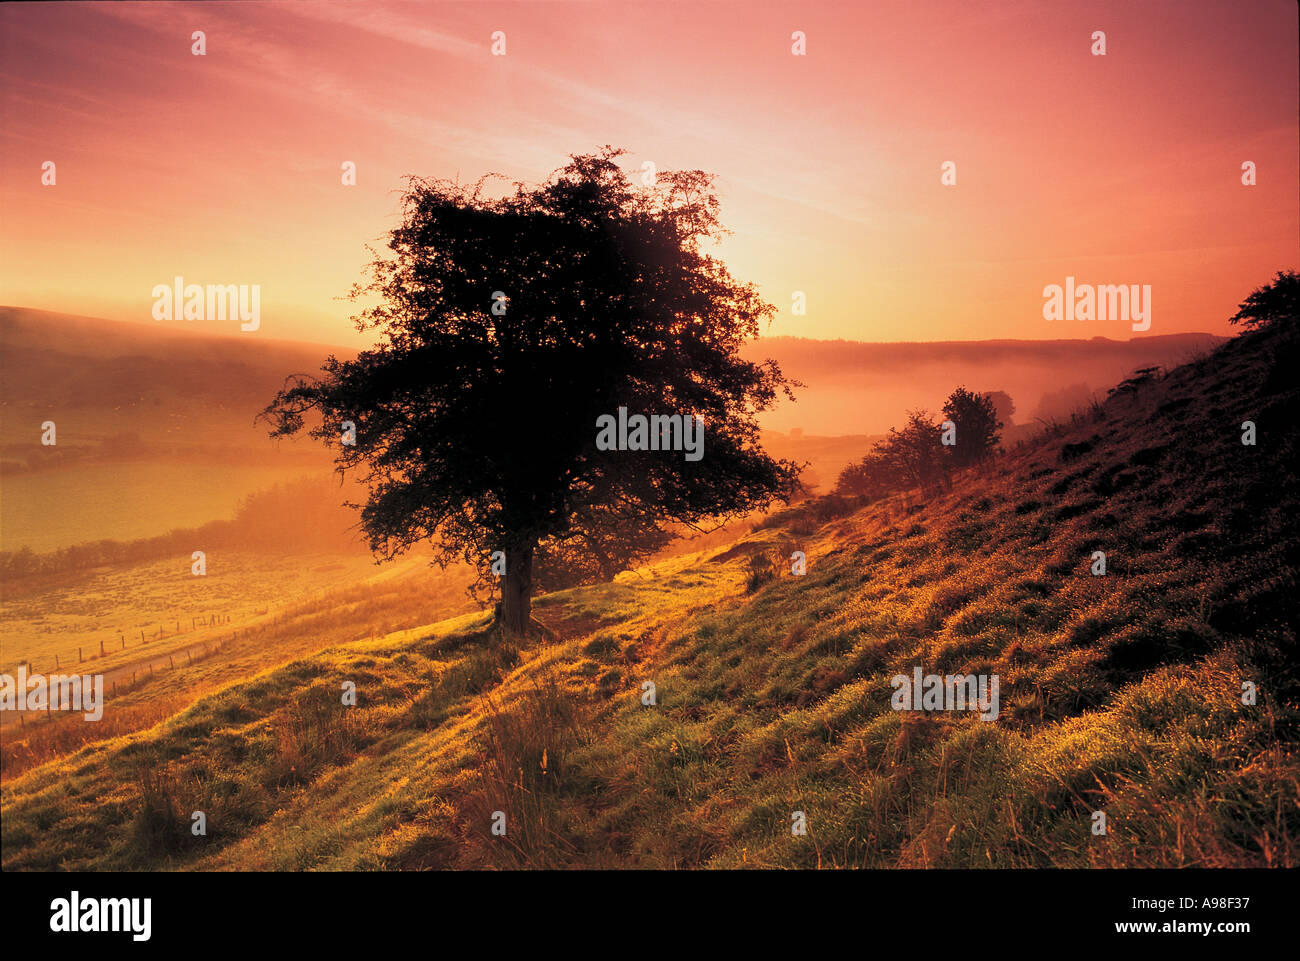 Sonnenuntergang in Wales Großbritannien Stockbild